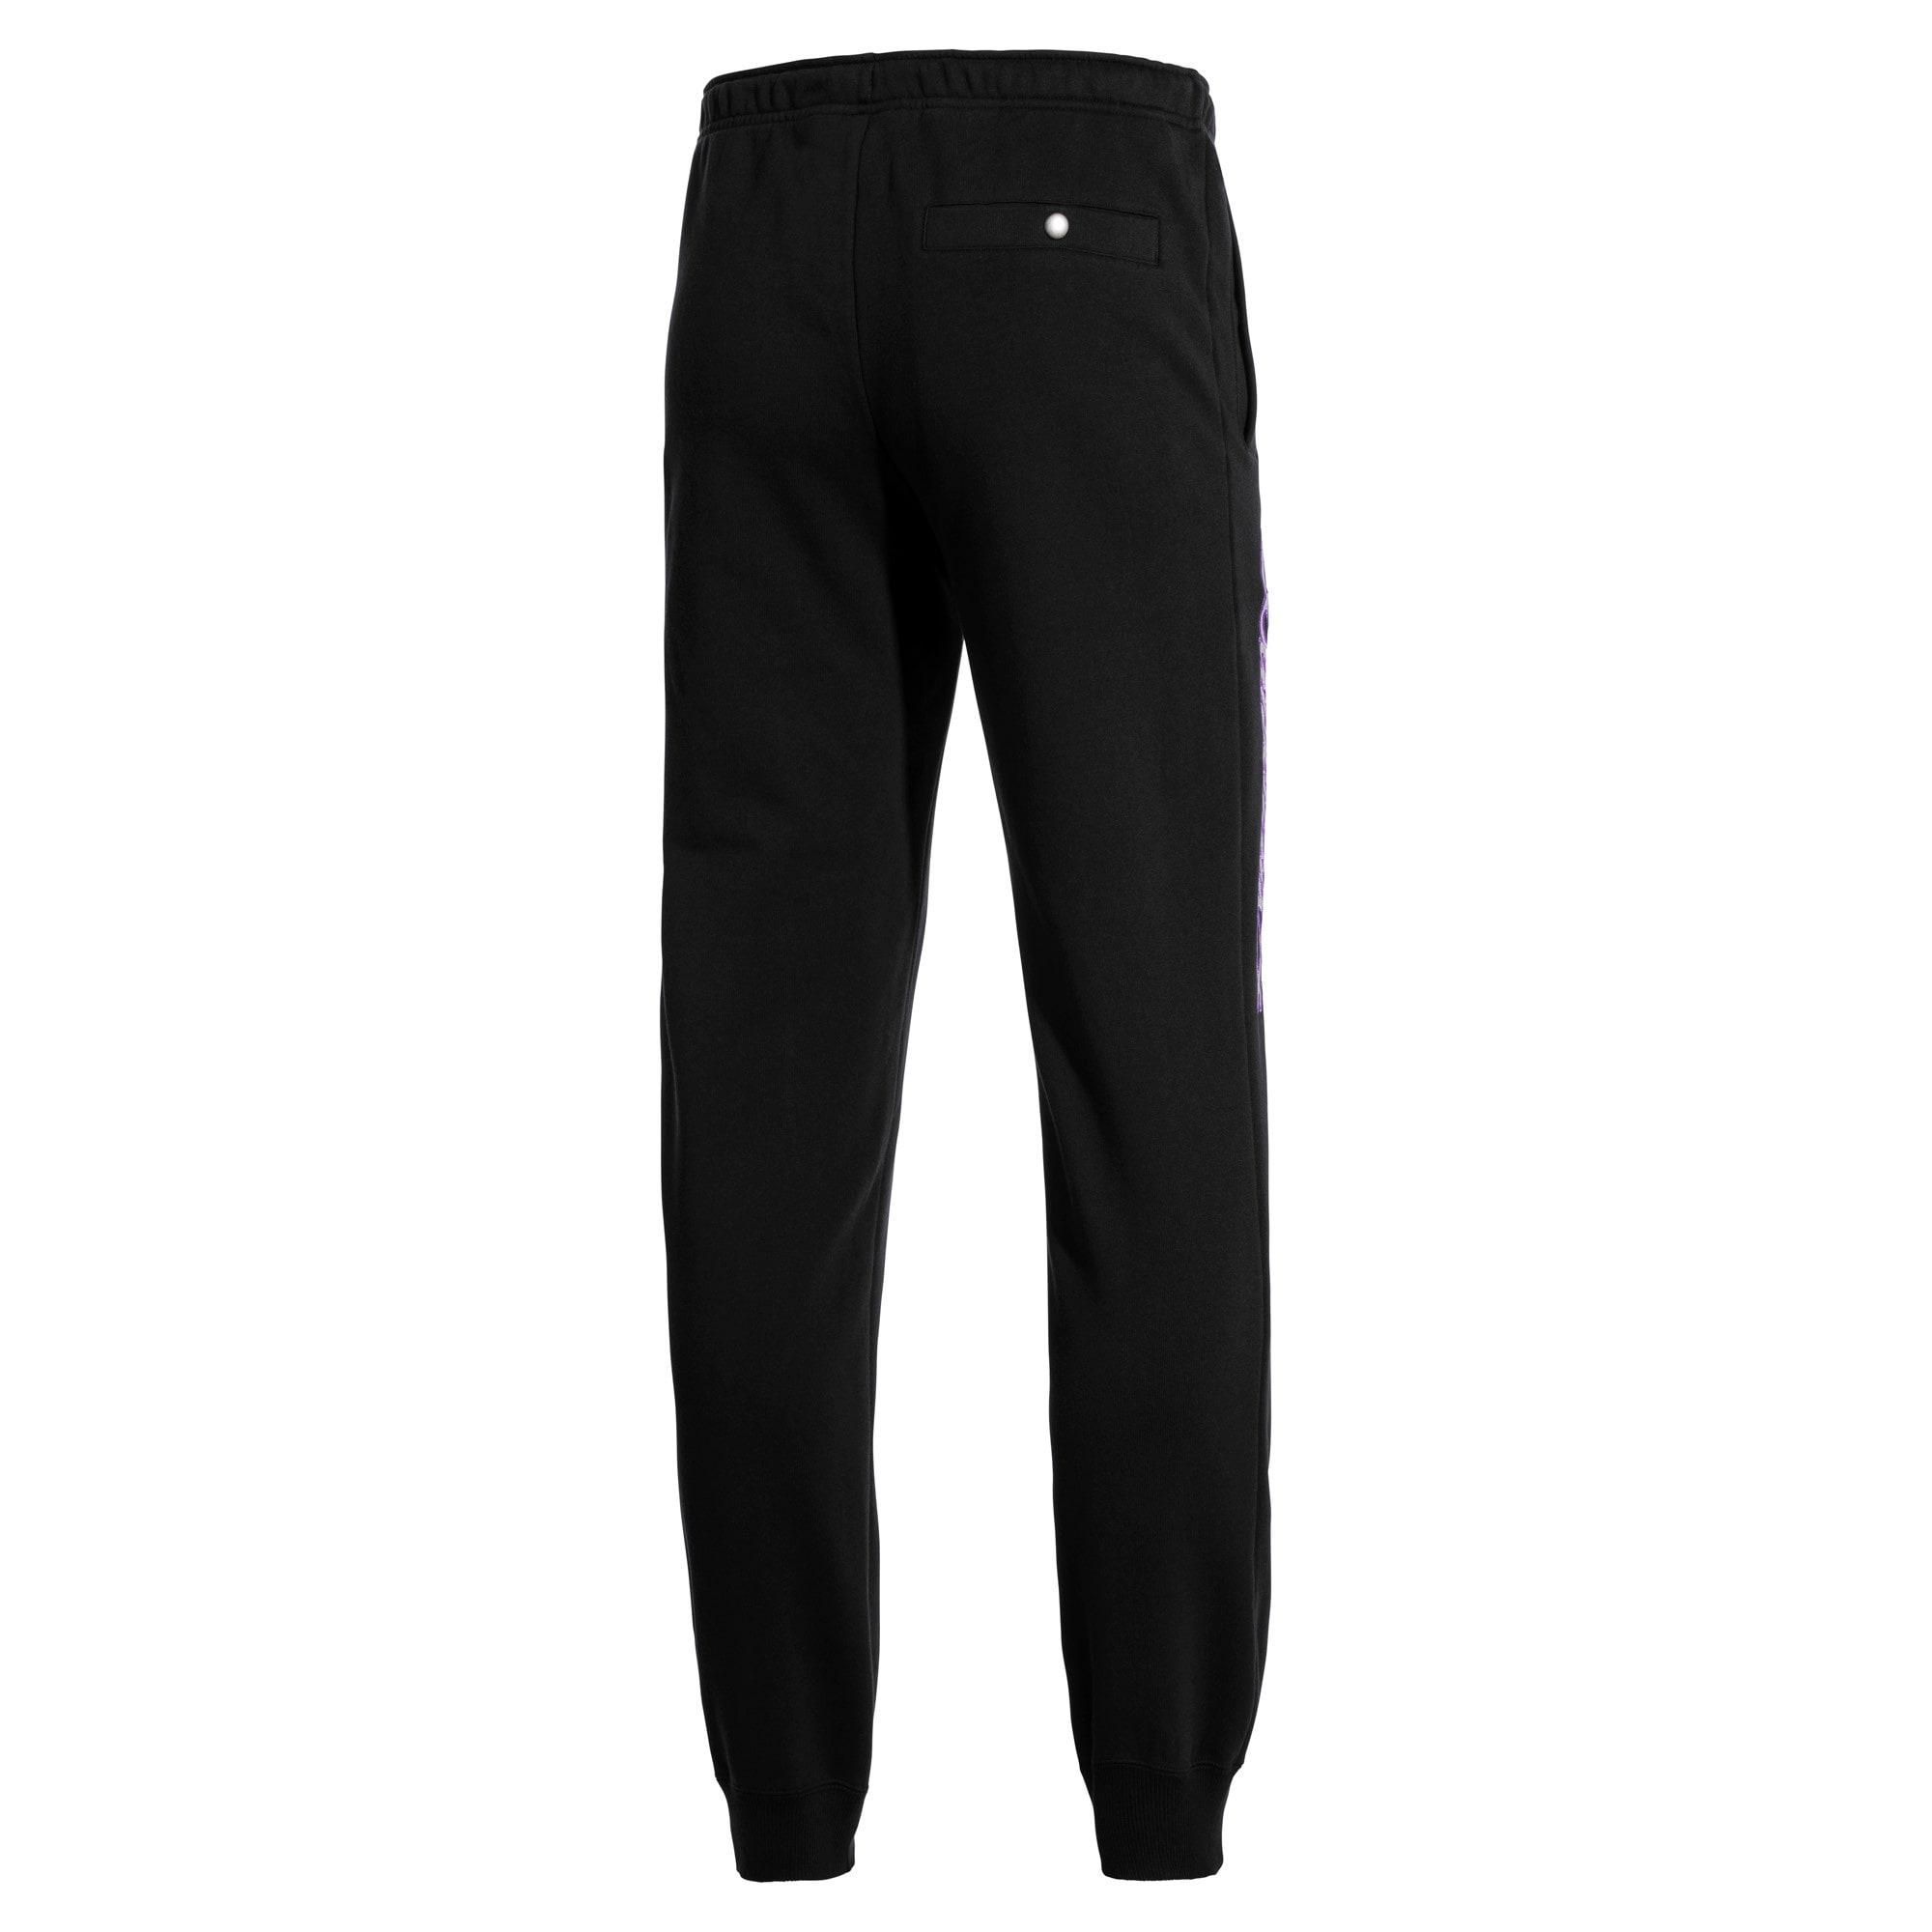 Thumbnail 4 of PUMA x SANKUANZ Women's Pants, Cotton Black, medium